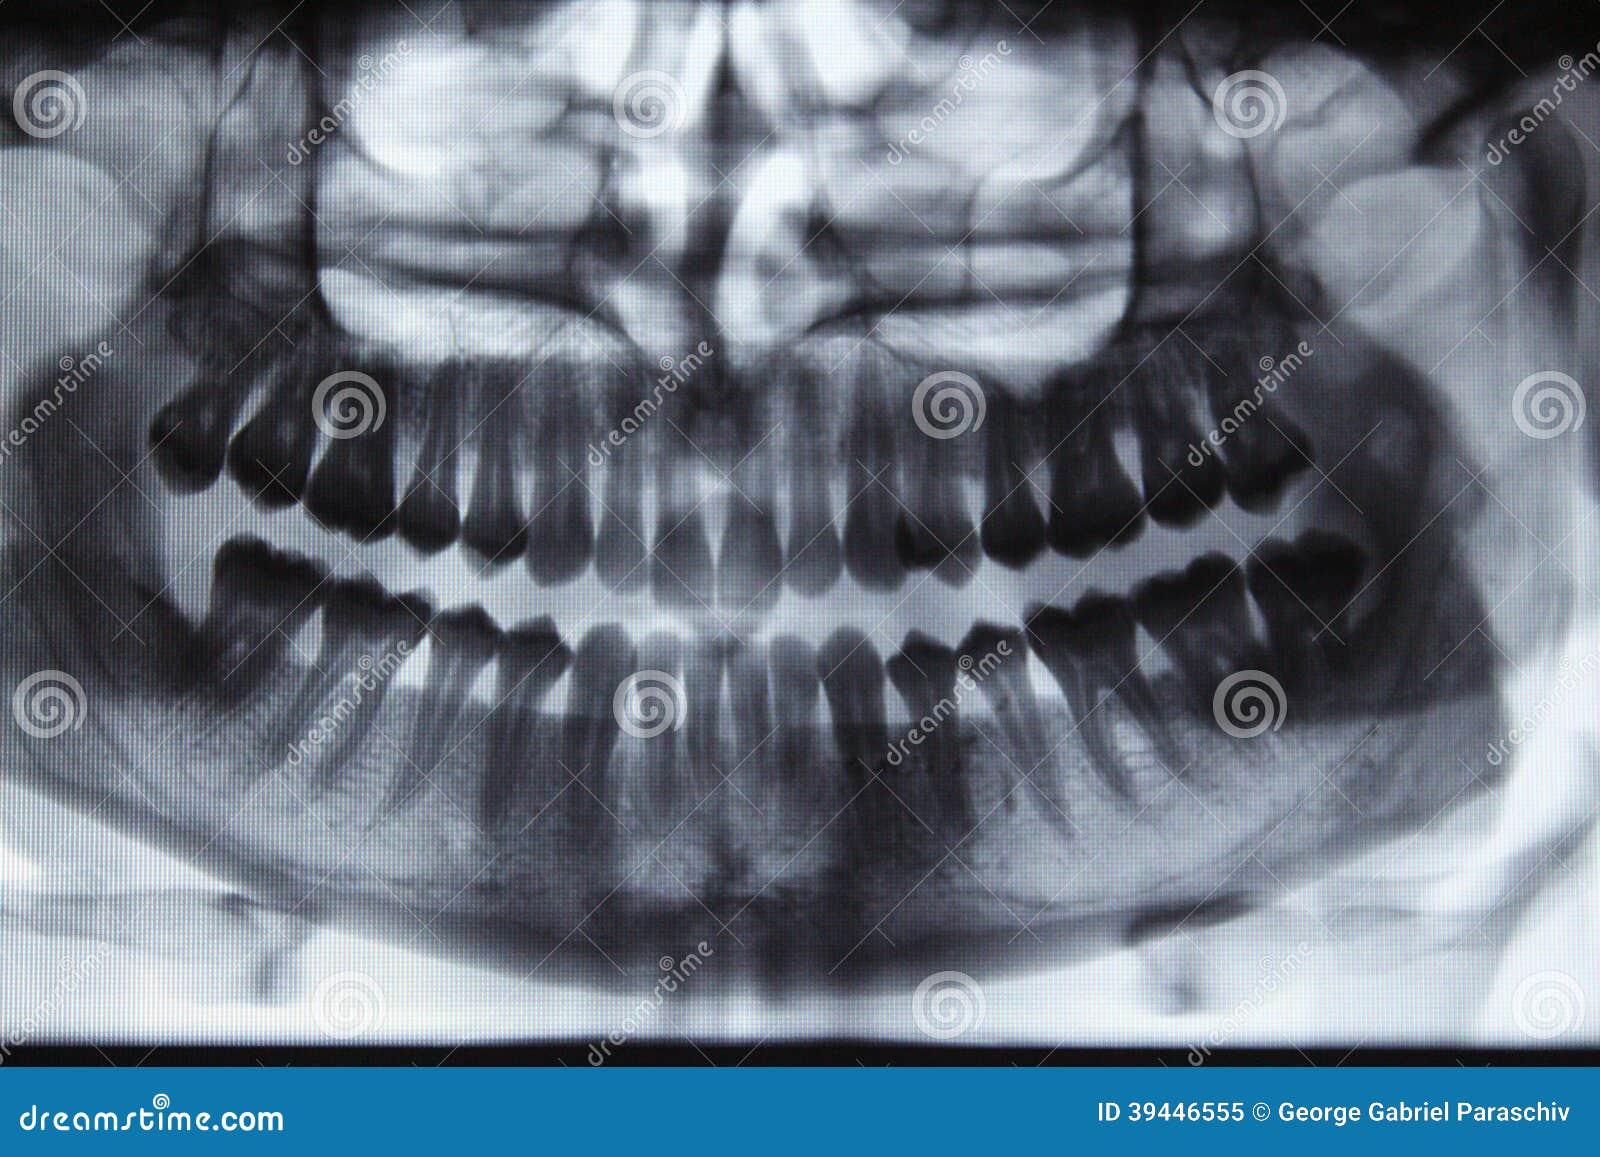 Panoramic dental X-ray stock image. Image of health, anatomy - 39446555